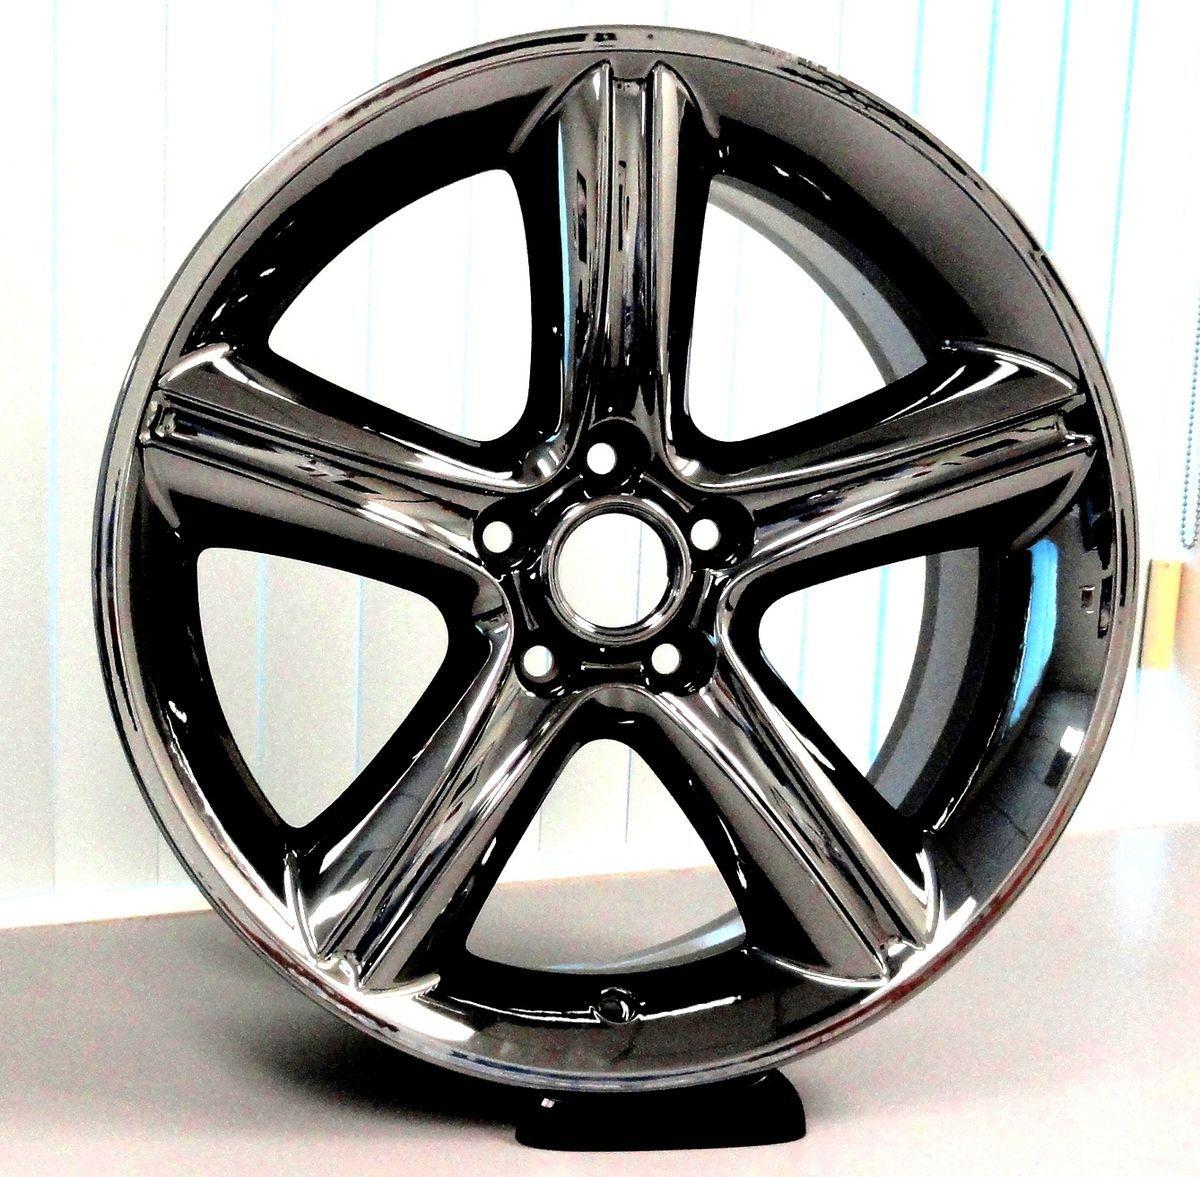 Ford Mustang 2010 2012 19 x 8 5 Black Chrome PVD Wheels Rims